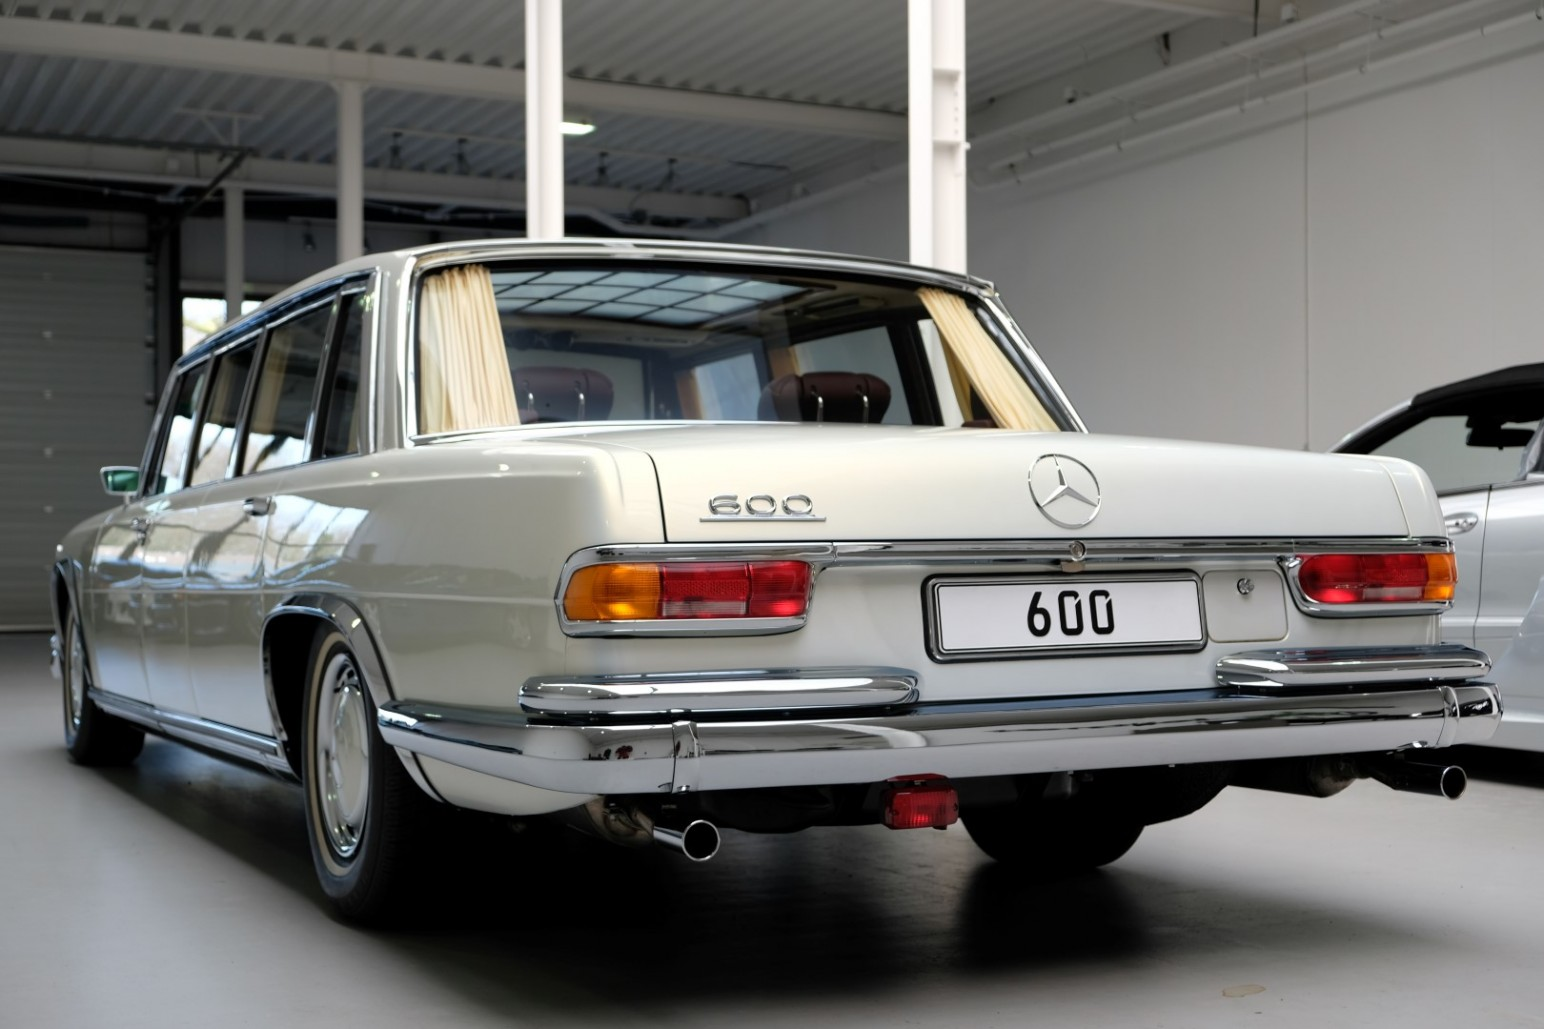 Mercedes-Benz 600 Pullman rear